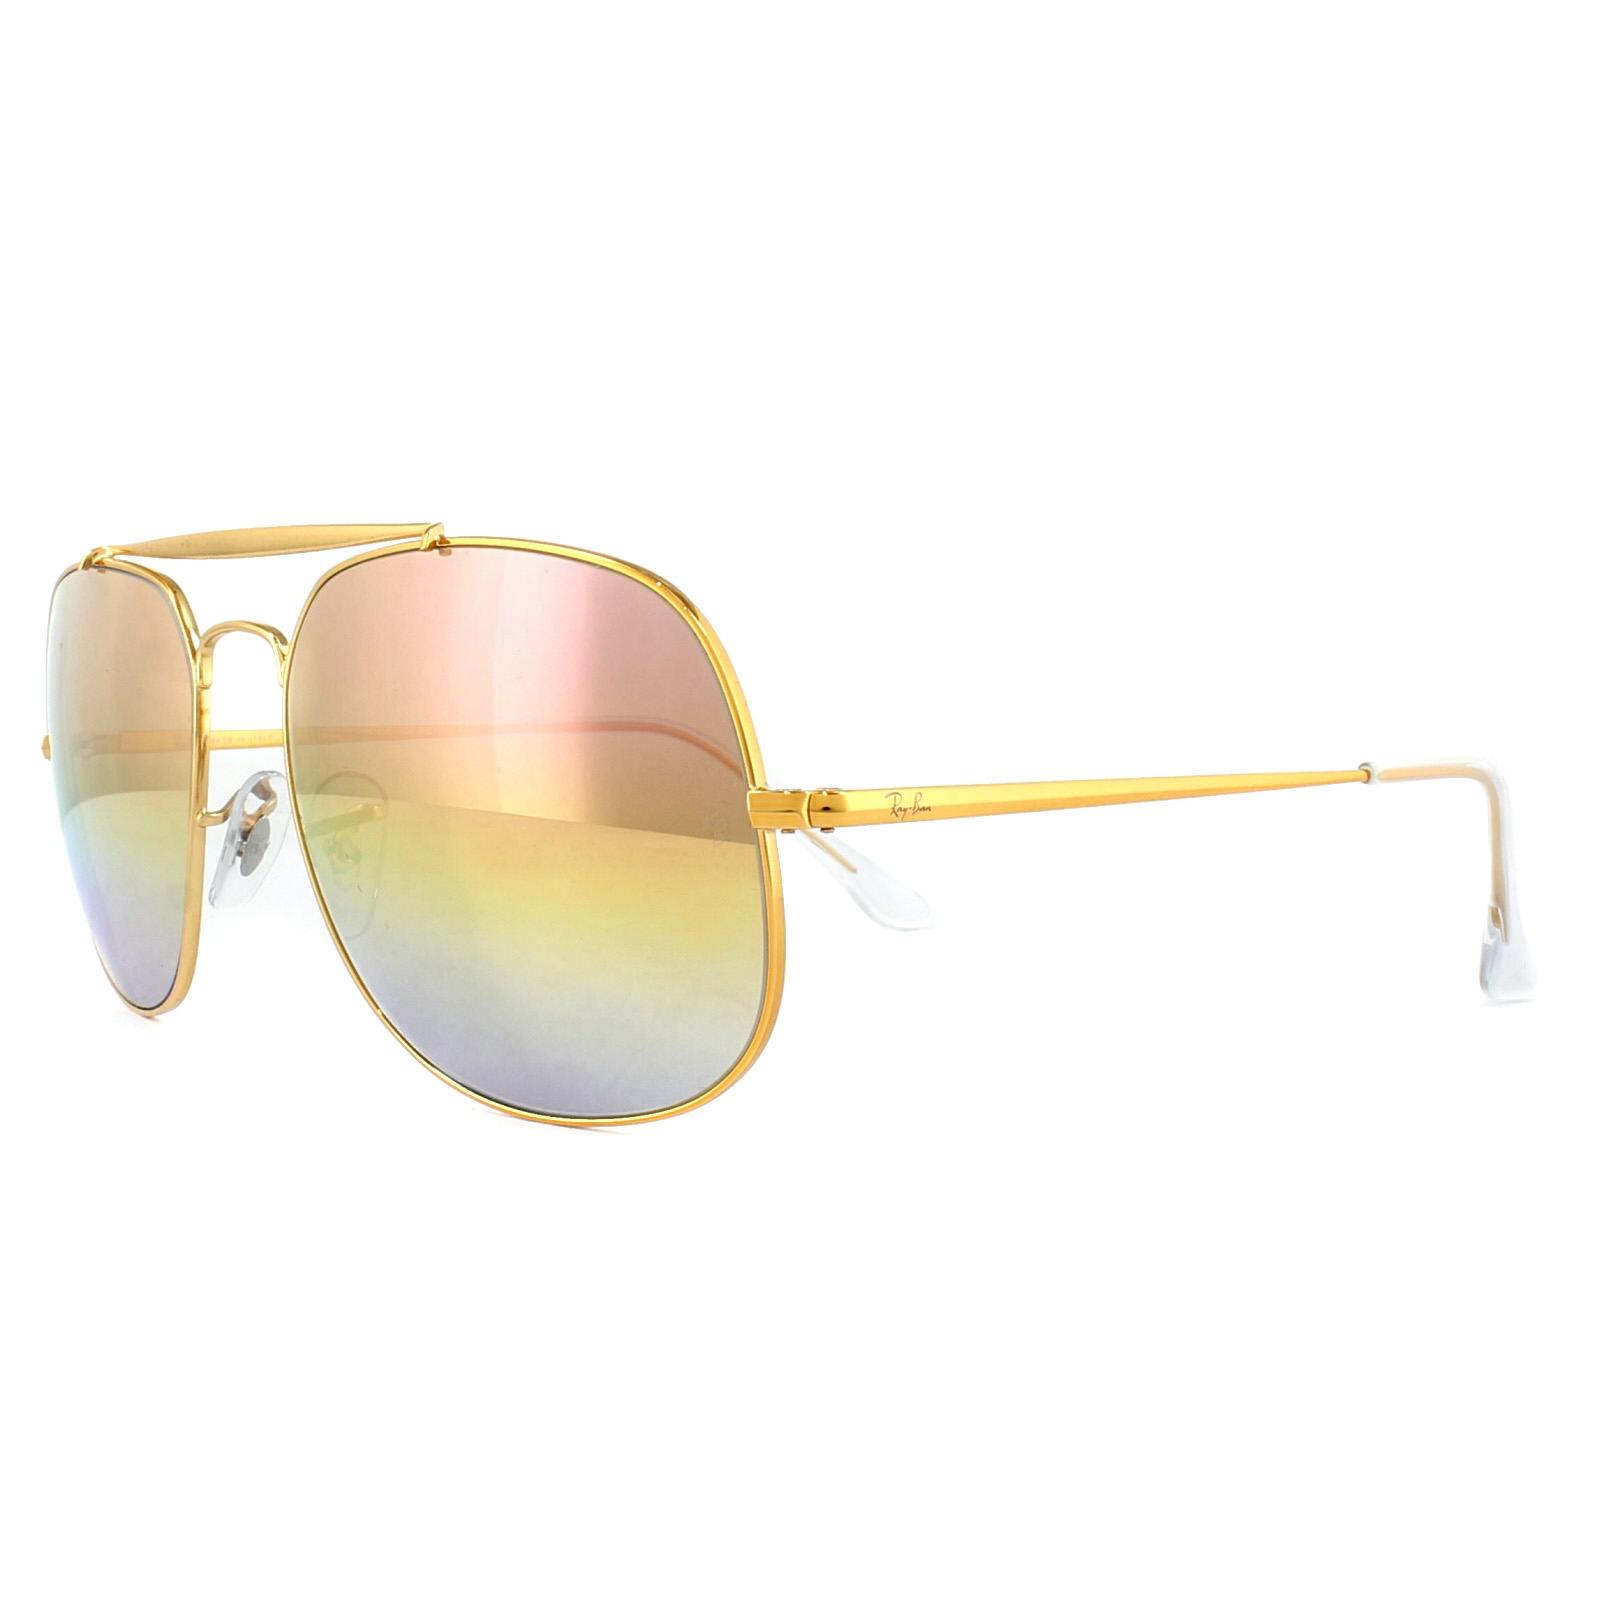 6bc3d39977181 Sentinel Ray-Ban Sunglasses General 3561 9001I1 Bronze Copper Pink Gradient  Mirror